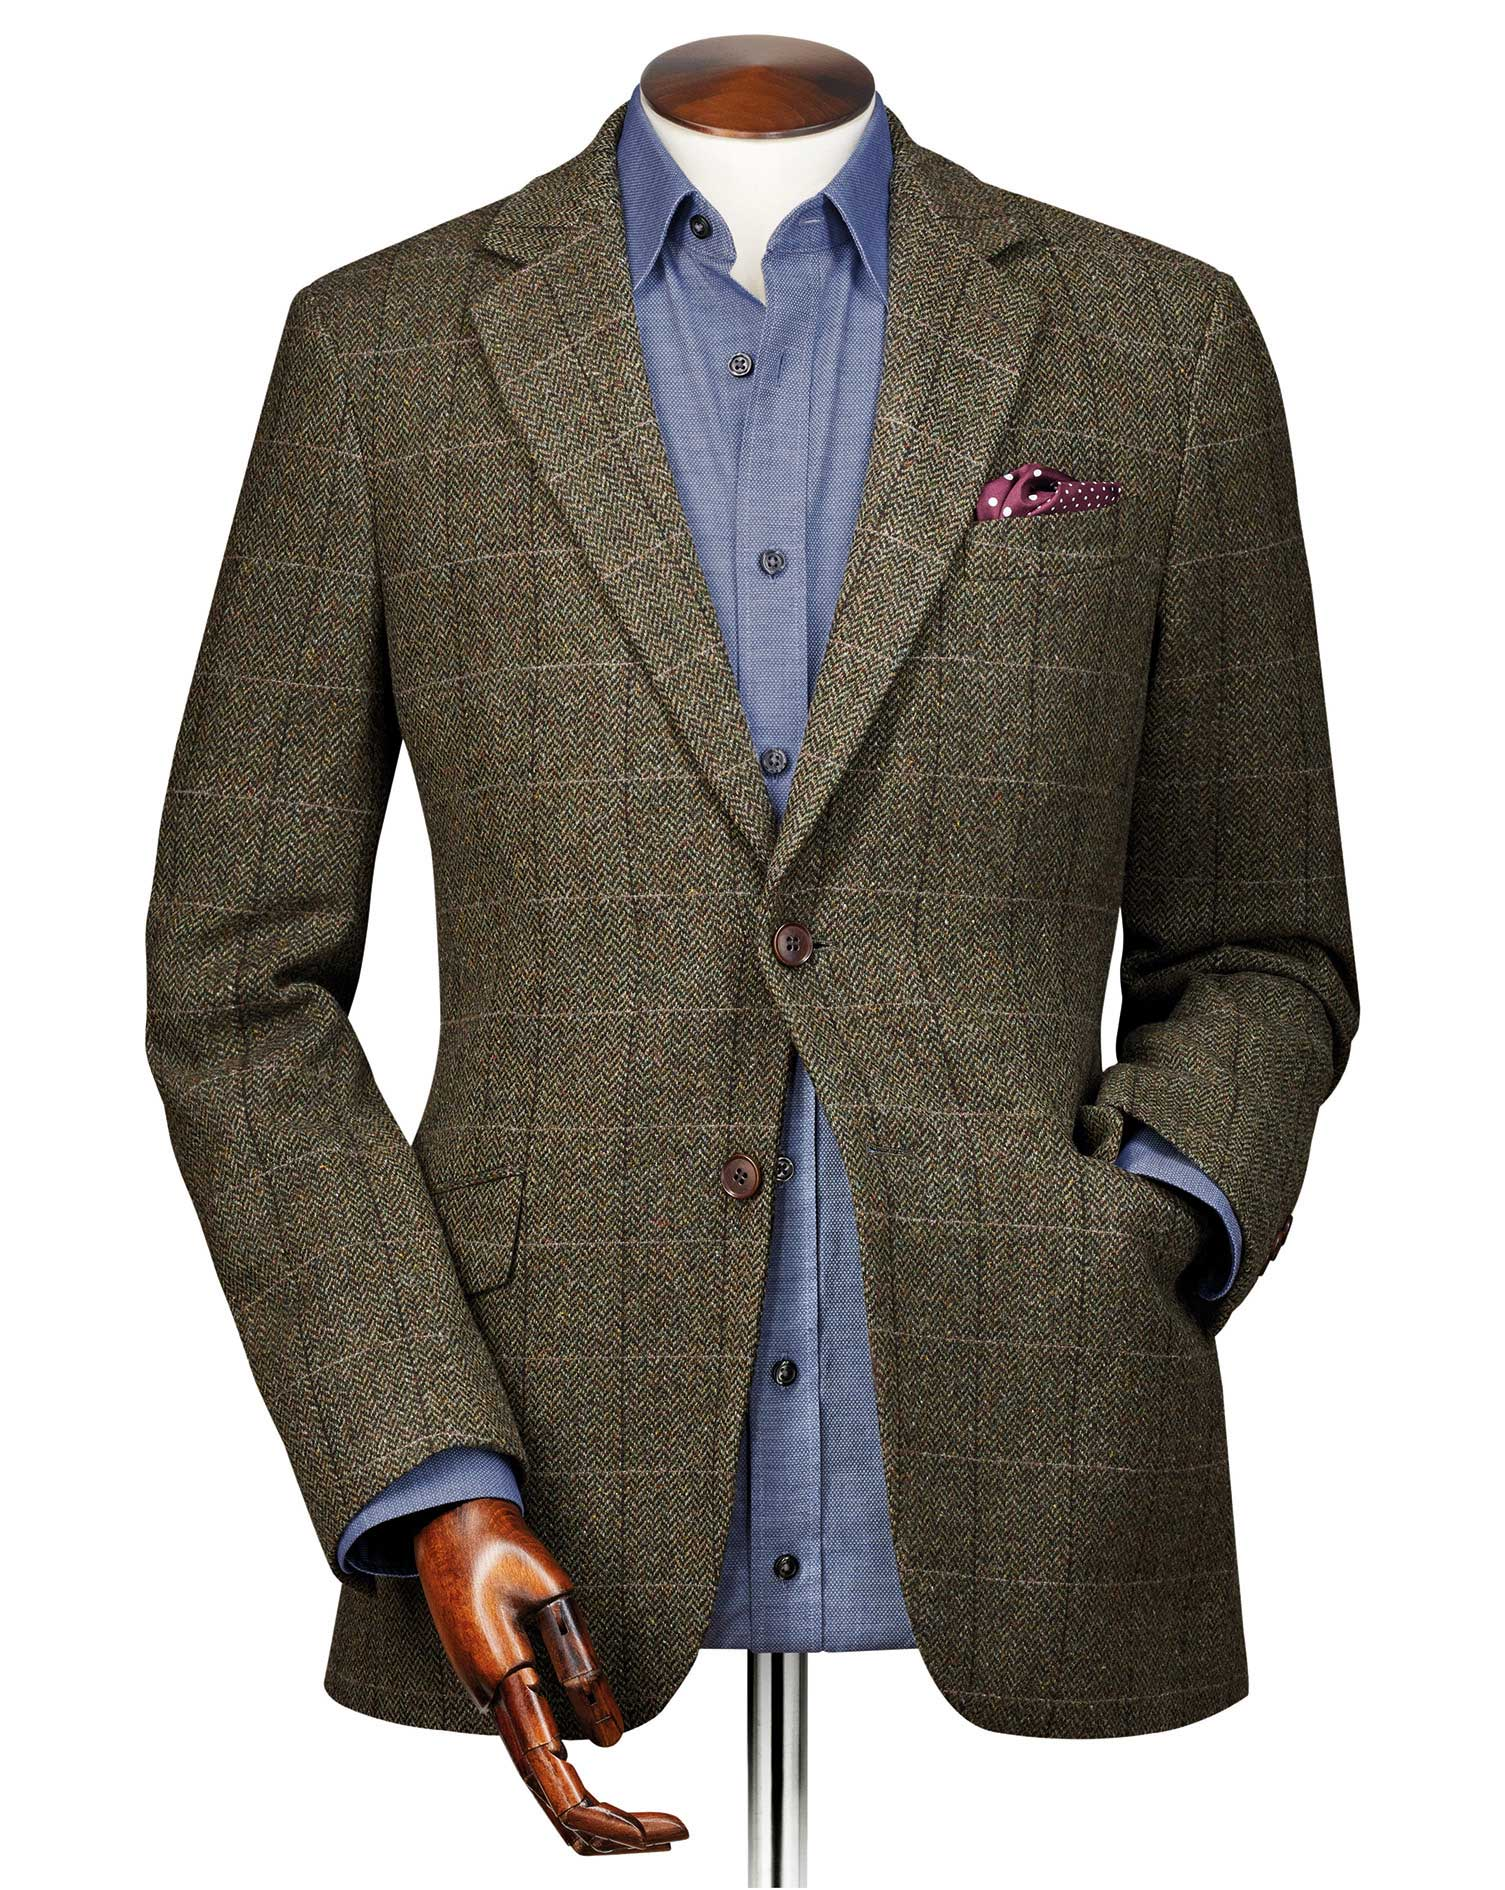 Slim Fit Green Herringbone Checkered Wool Jacket Size 36 Regular by Charles Tyrwhitt